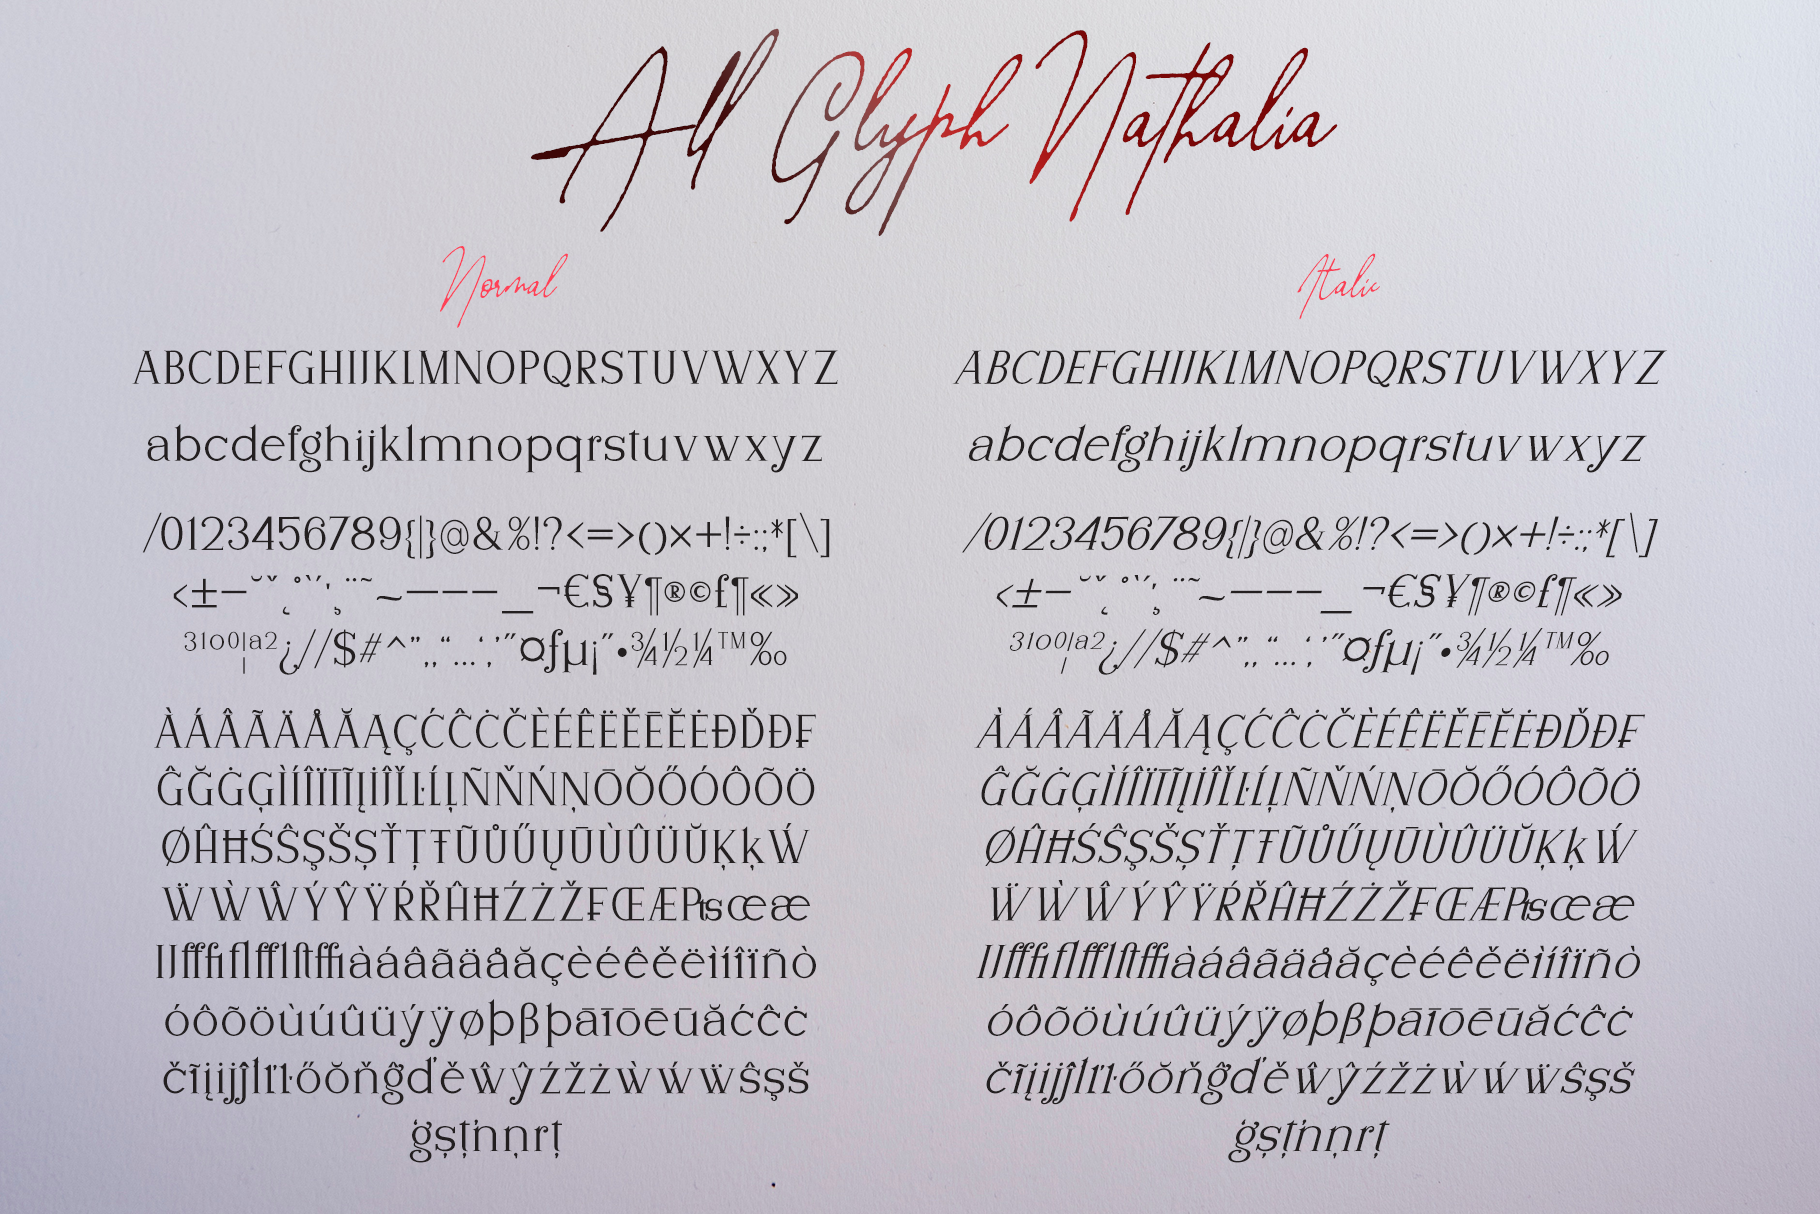 Angelica Feat Nathalia example image 7